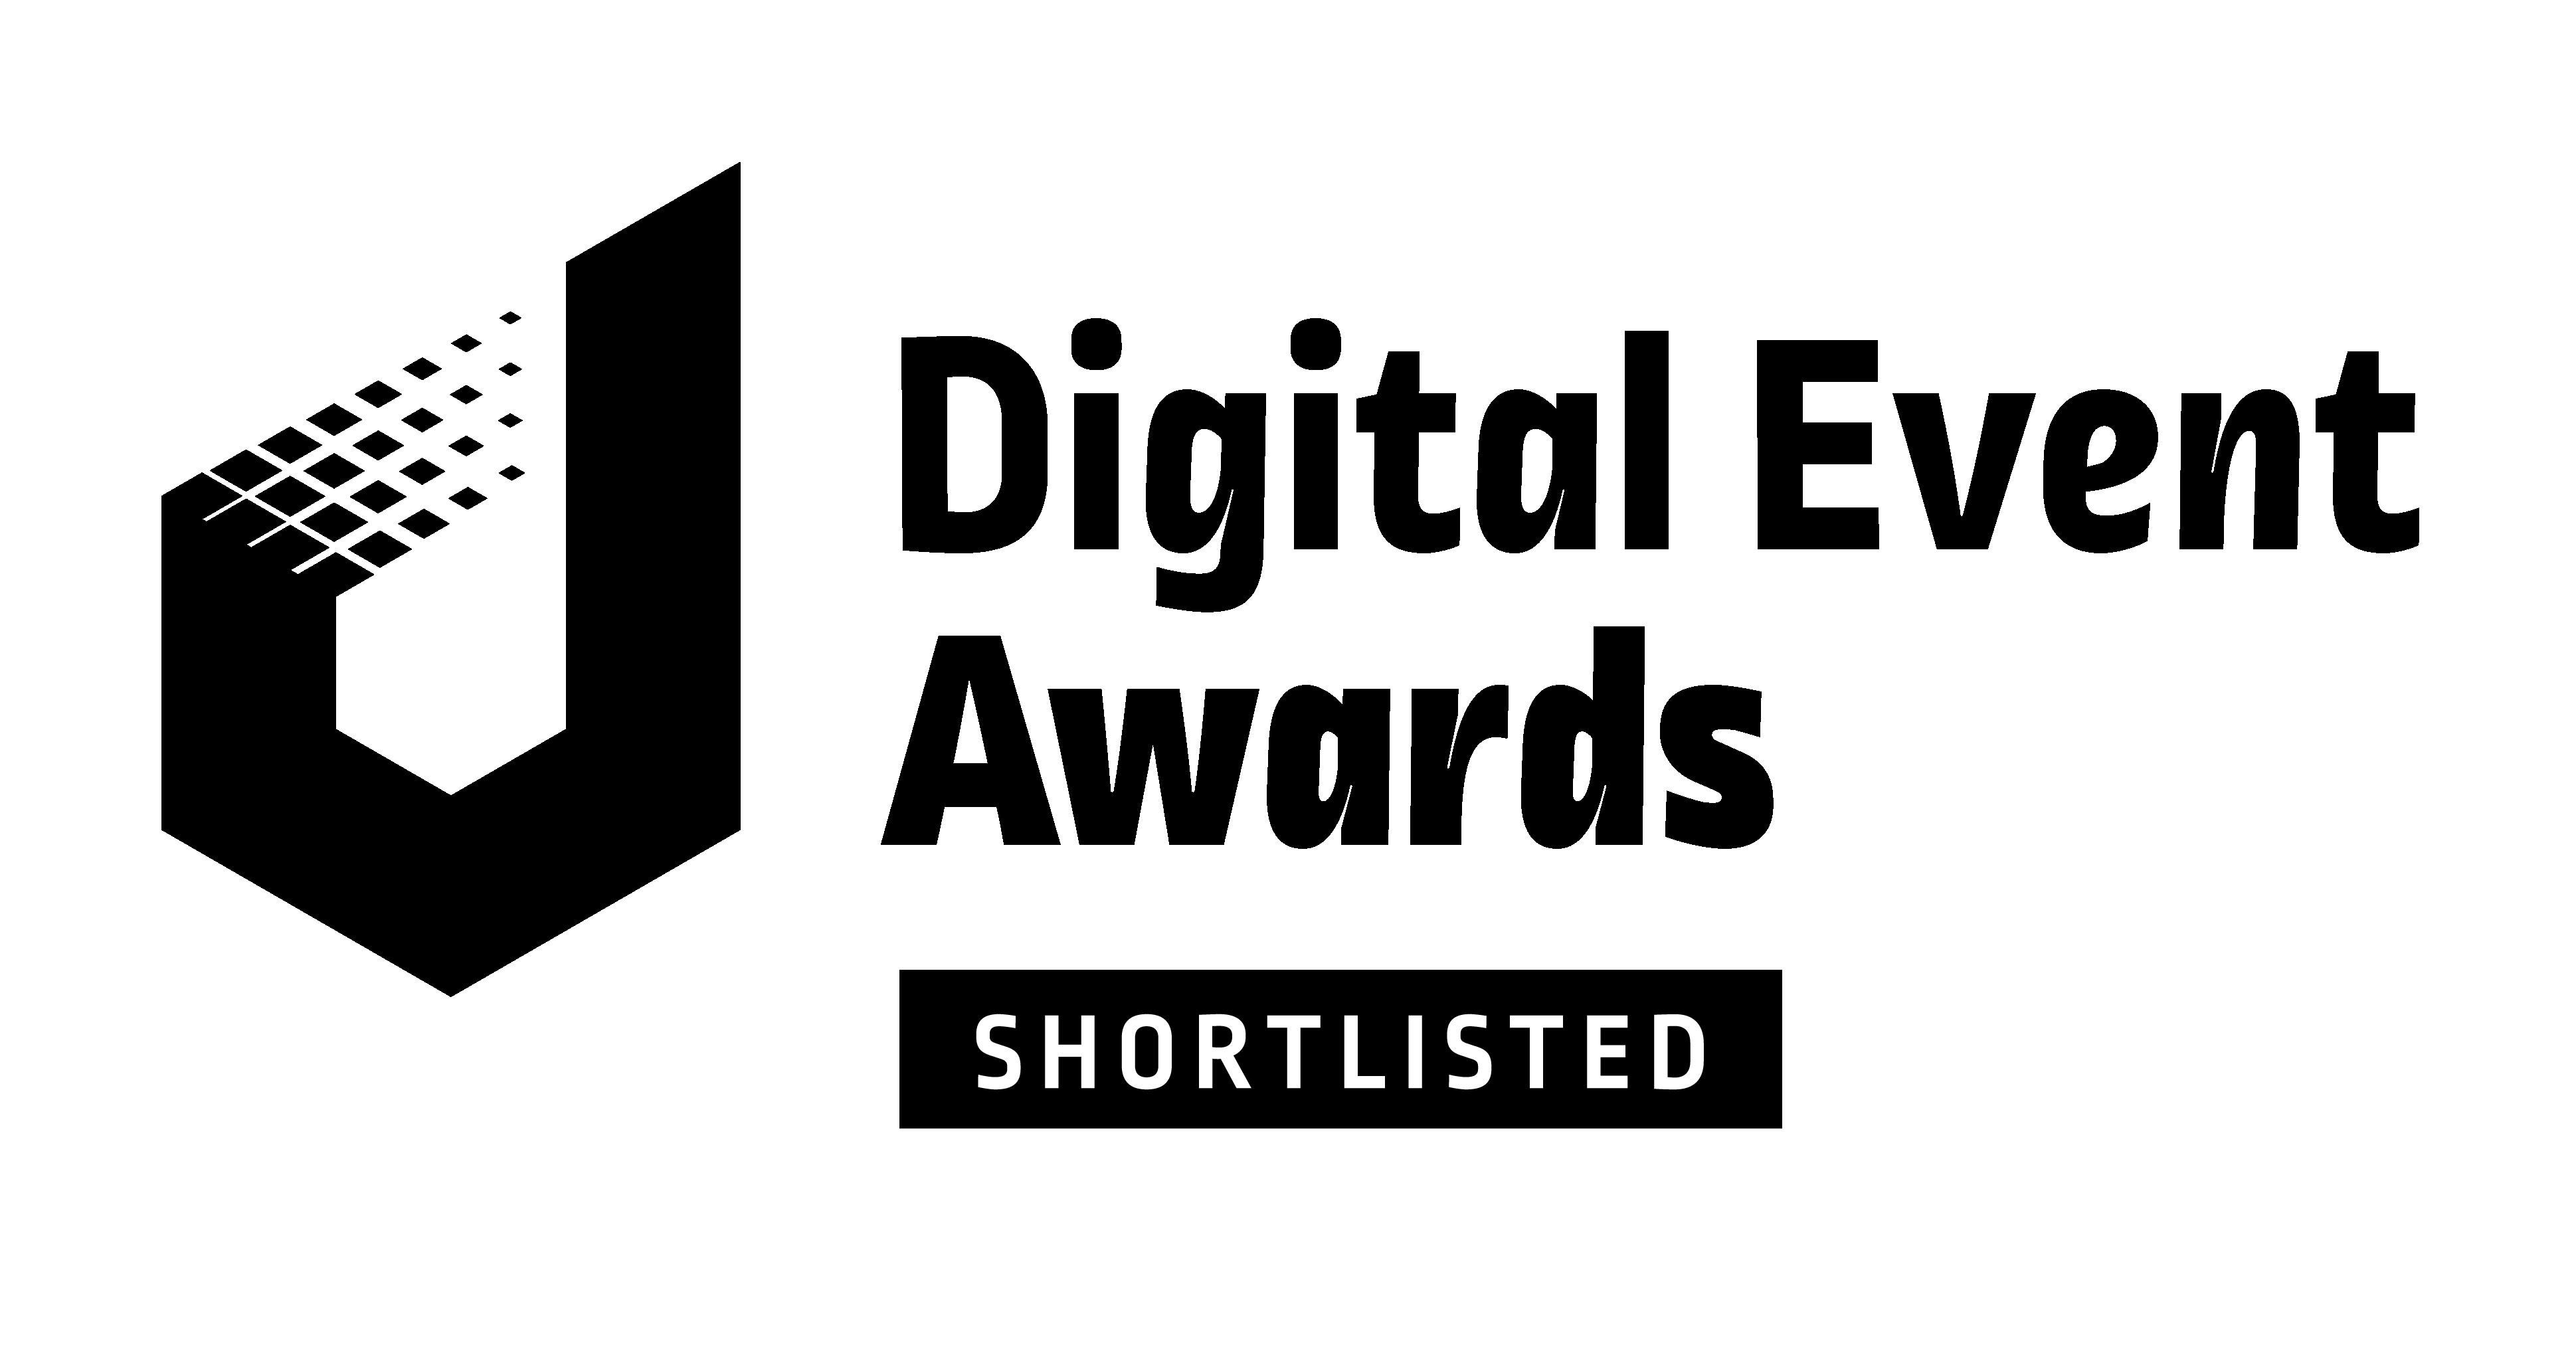 the digital event awards shortlisted logo